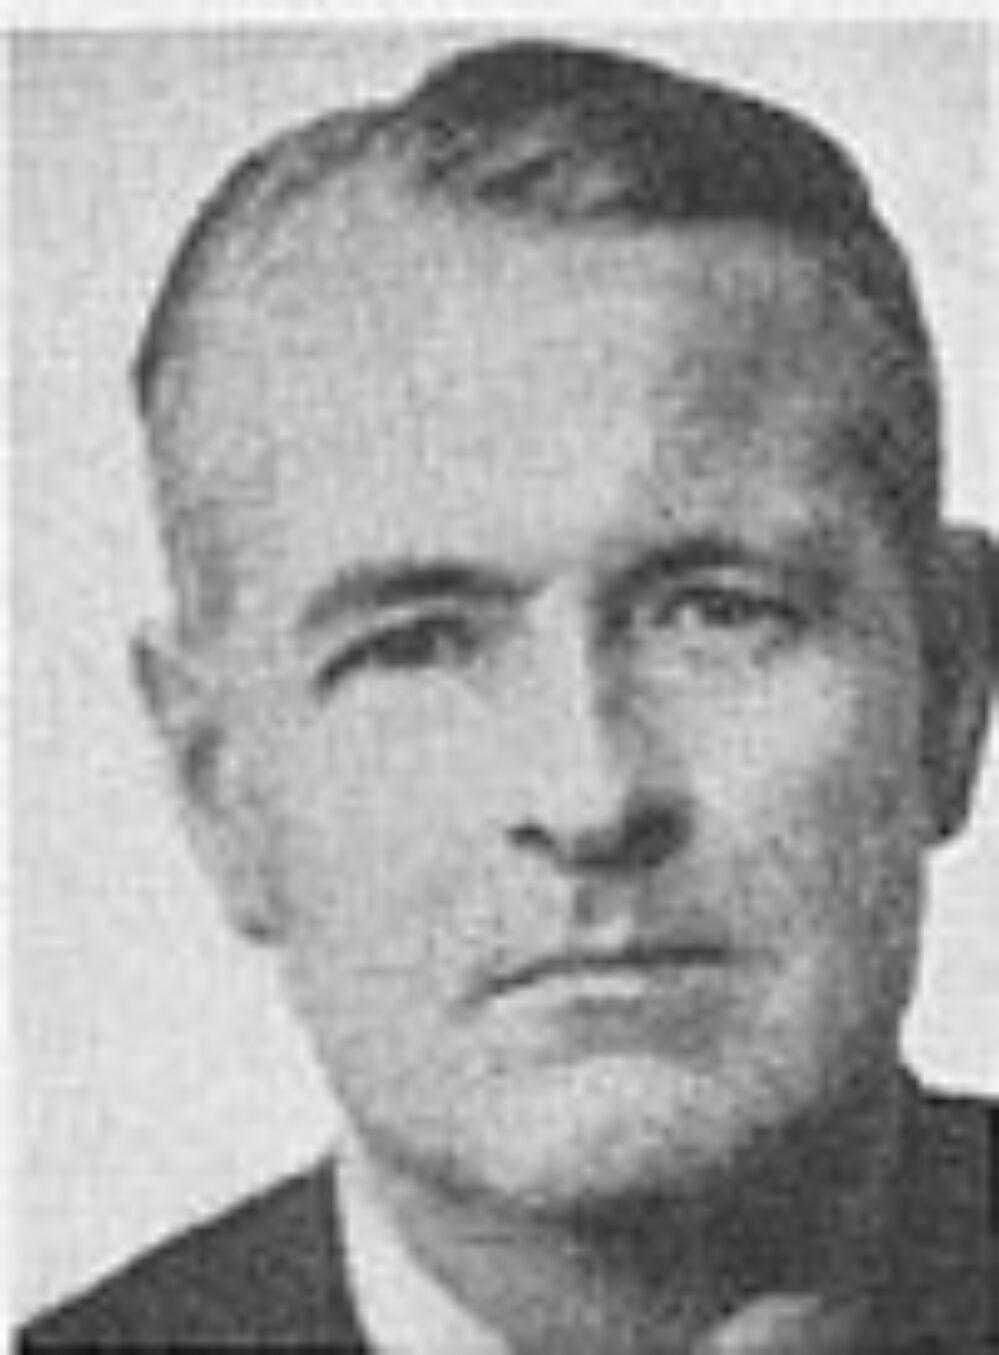 Nils Petter Alfred Hareide